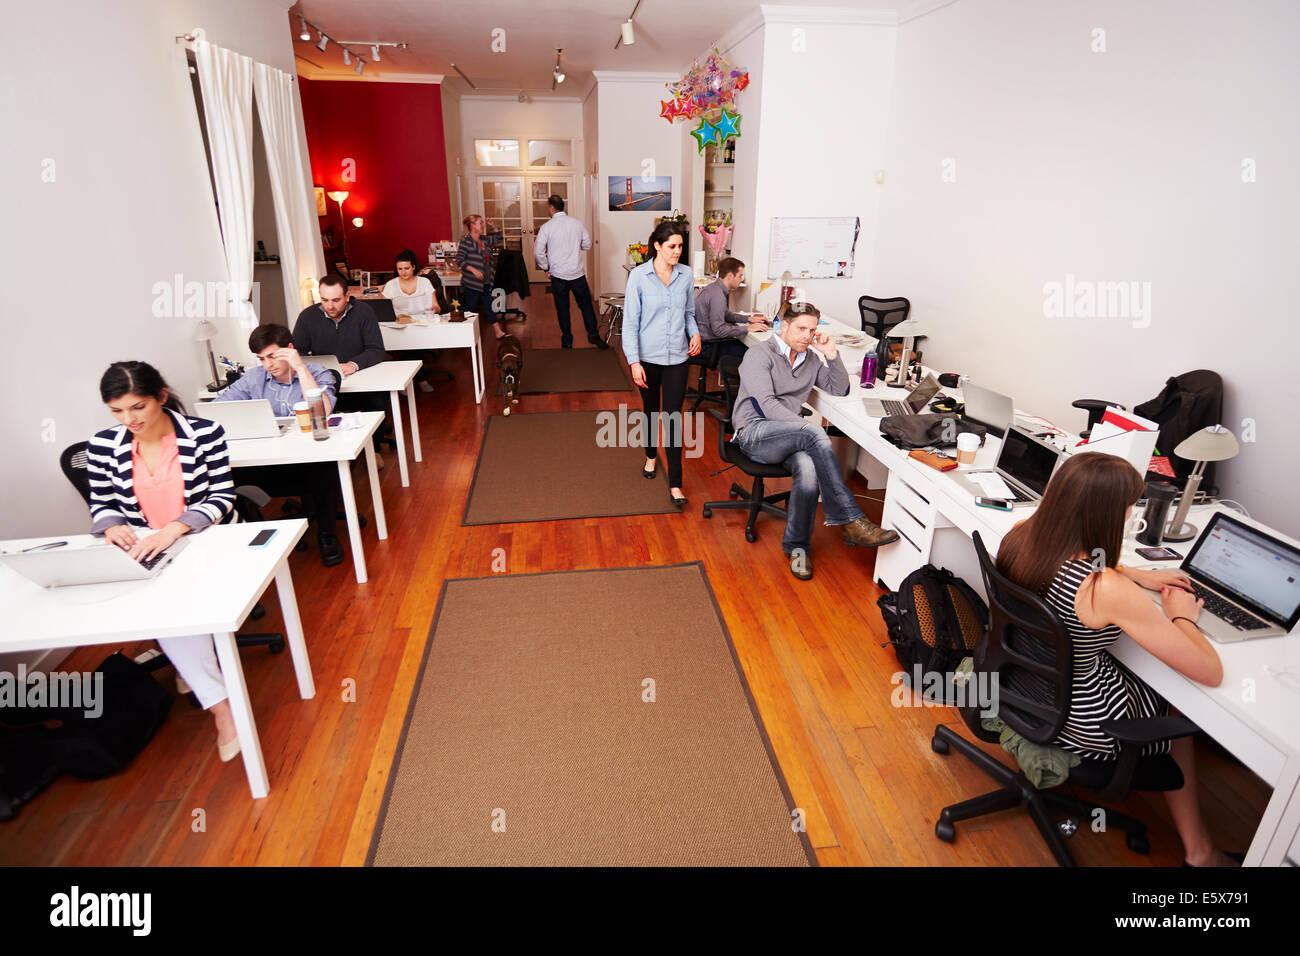 Menschen bei der Arbeit in modernen Büro beschäftigt Stockbild